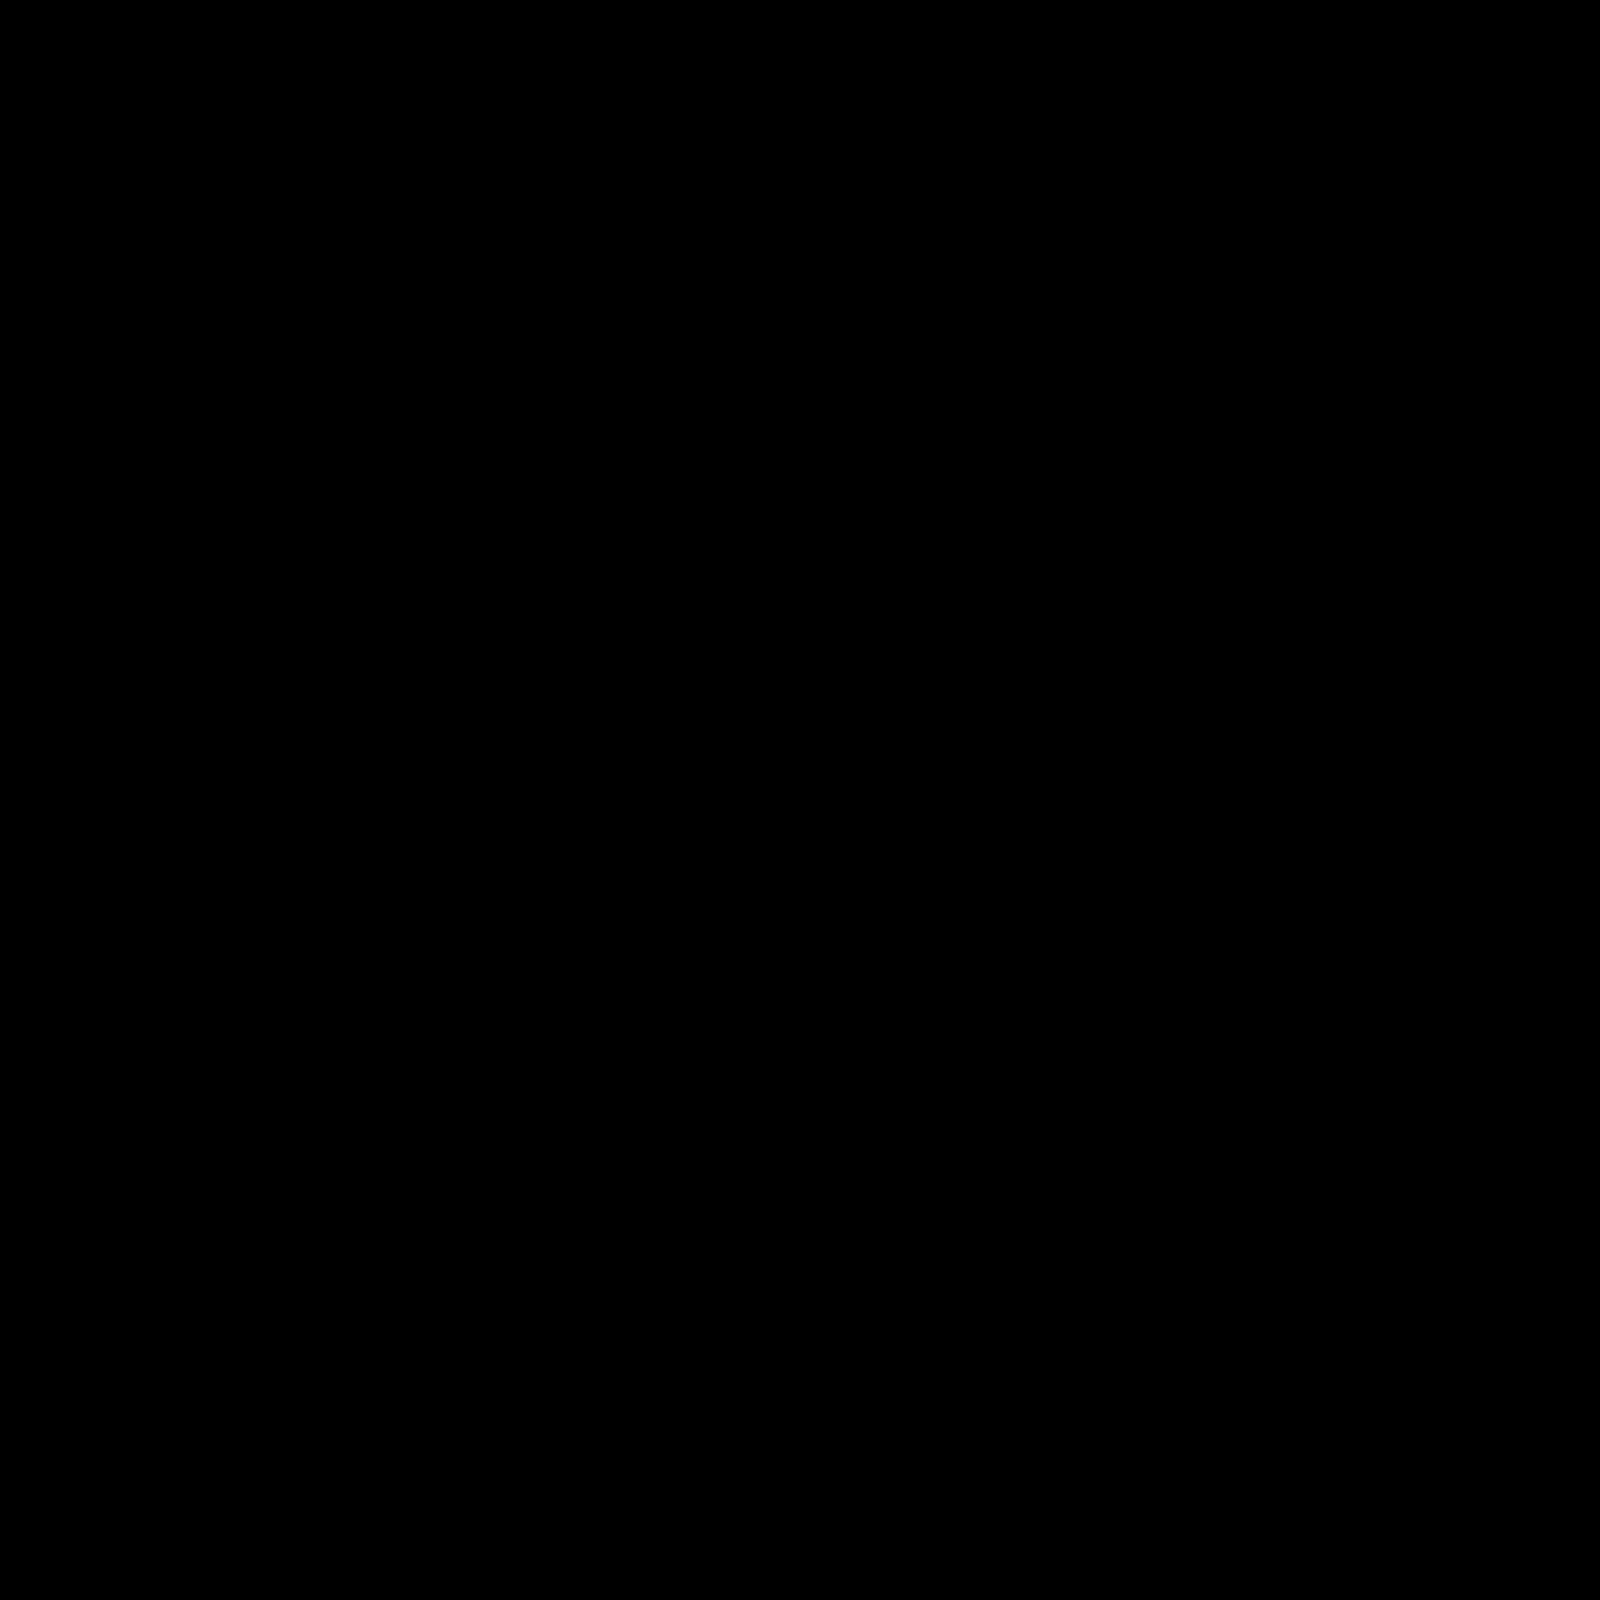 Obsada icon